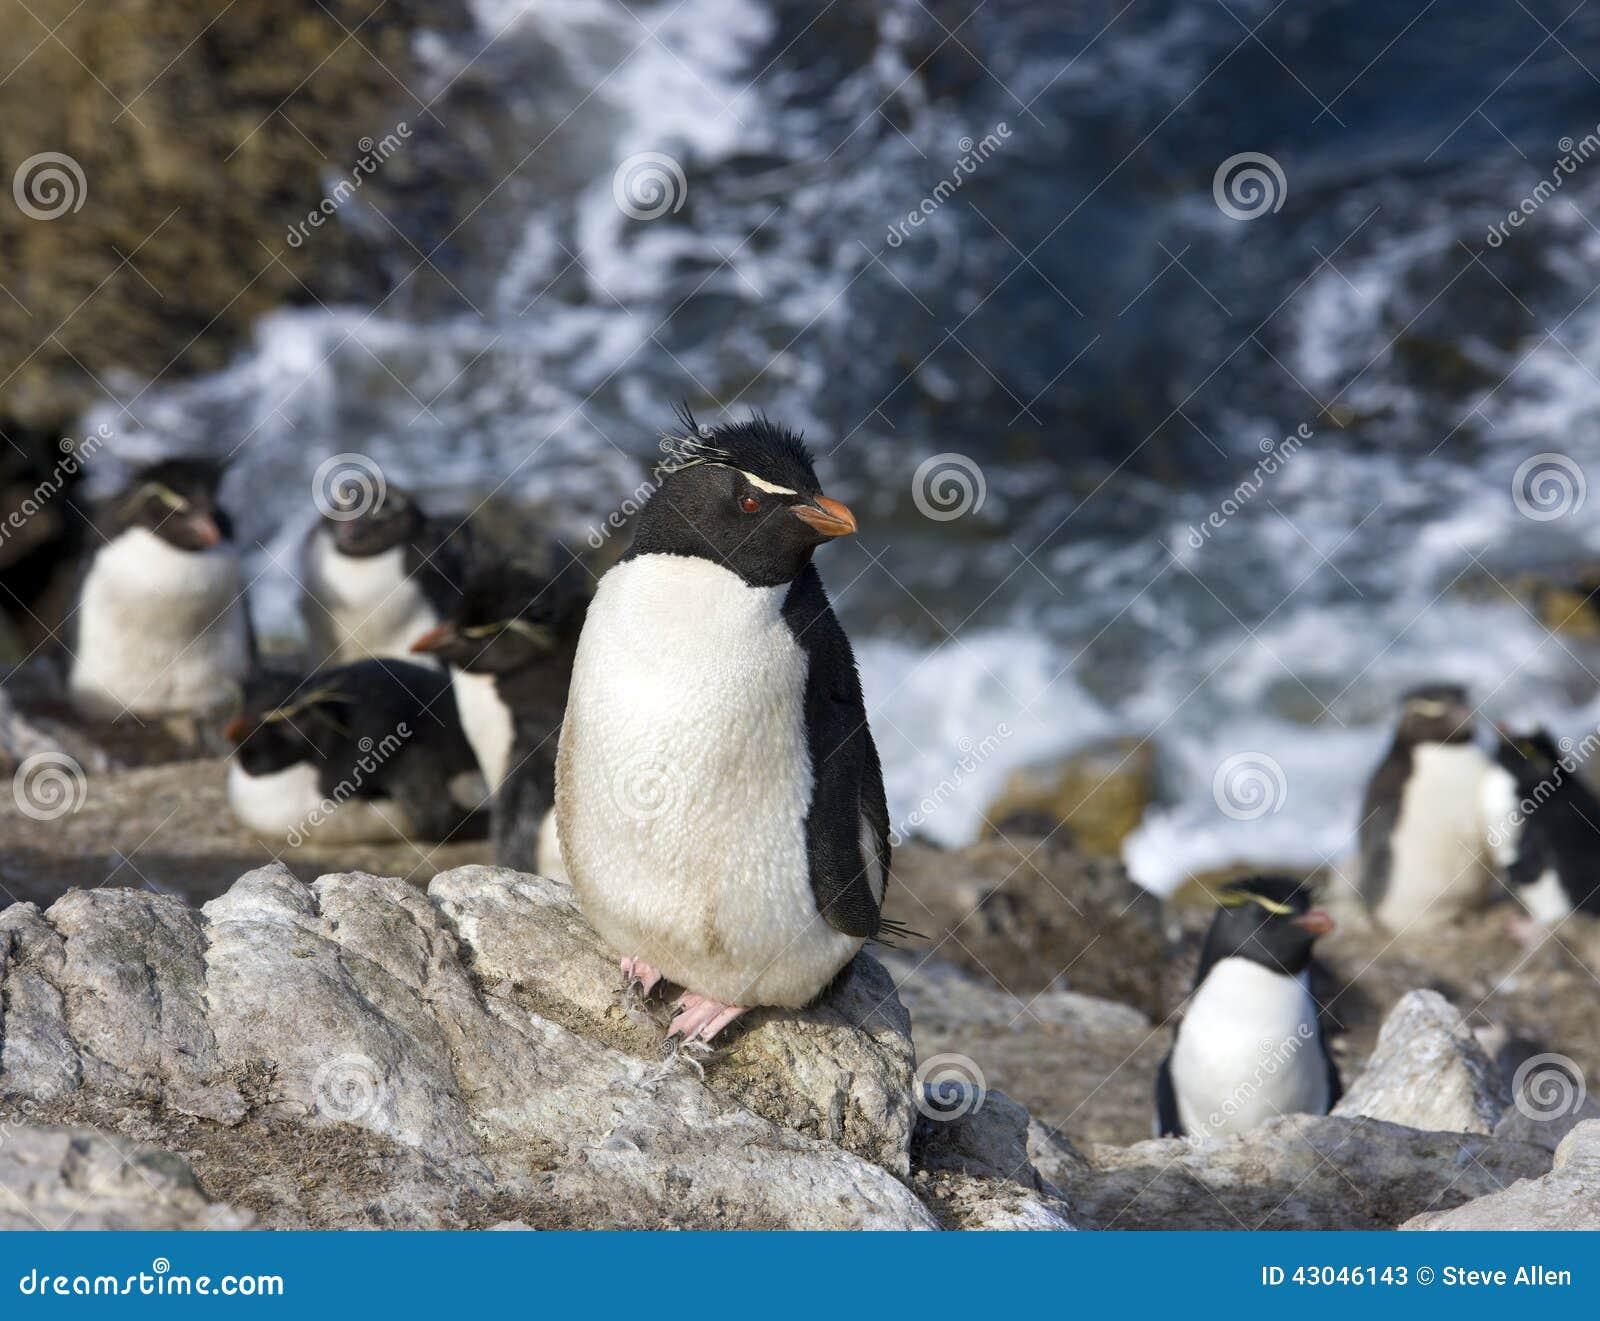 Rockhopper Penguins on Pebble Island in The Falkland Islands